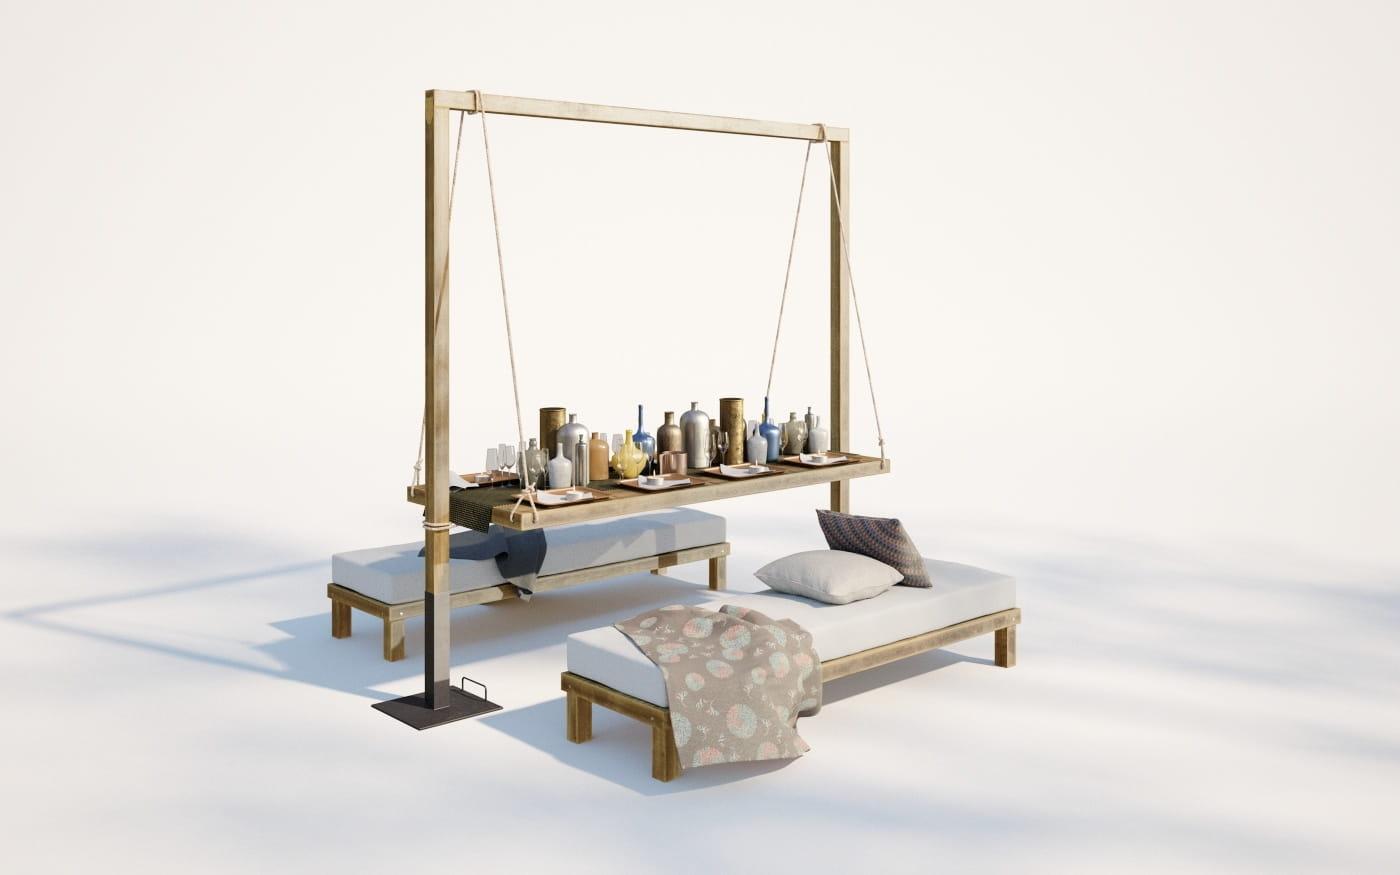 Furniture set 26 AM220 Archmodels